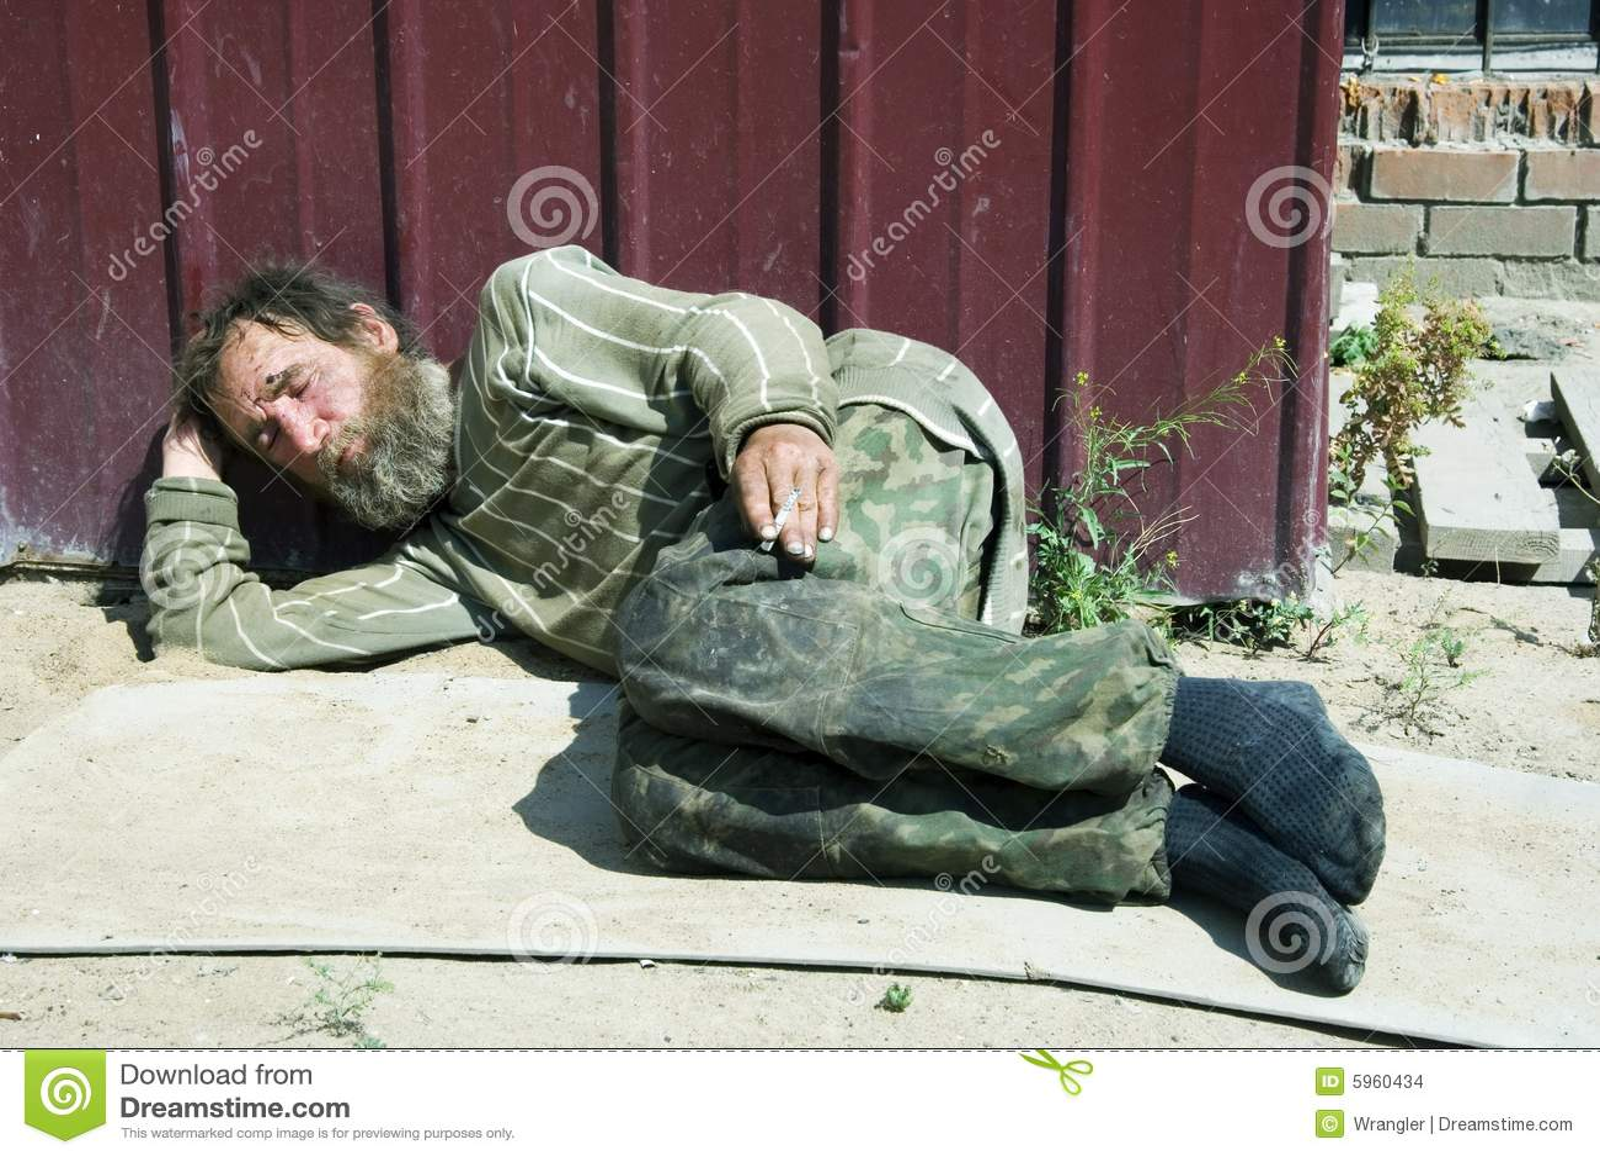 Sad Homeless Old Man Stock Images - Image: 5960434